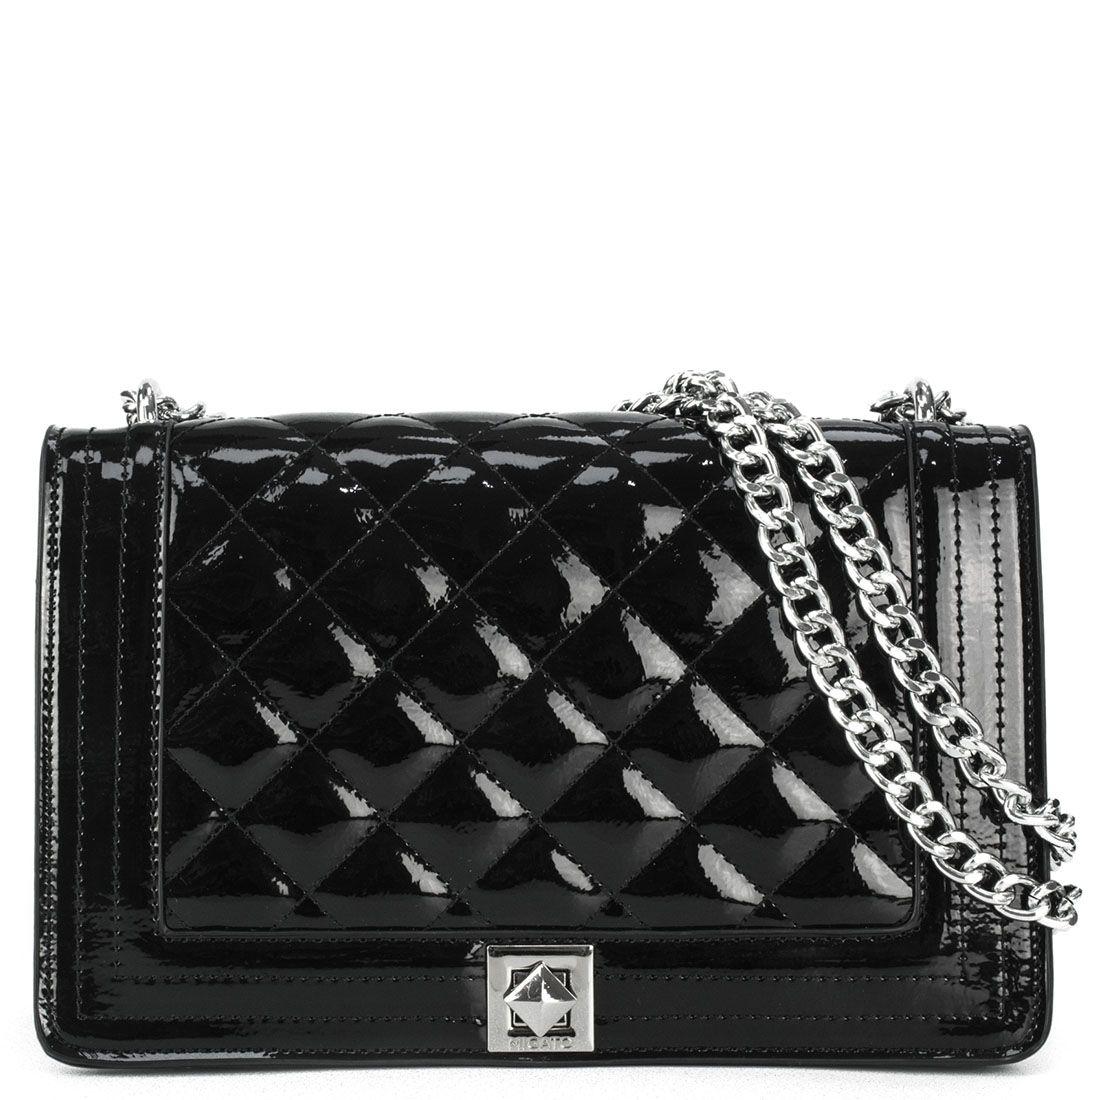 ead0304ee5 Τσάντες Βραδυνές Γυναικείες  Μαύρη καπιτονέ τσάντα λουστρίνι